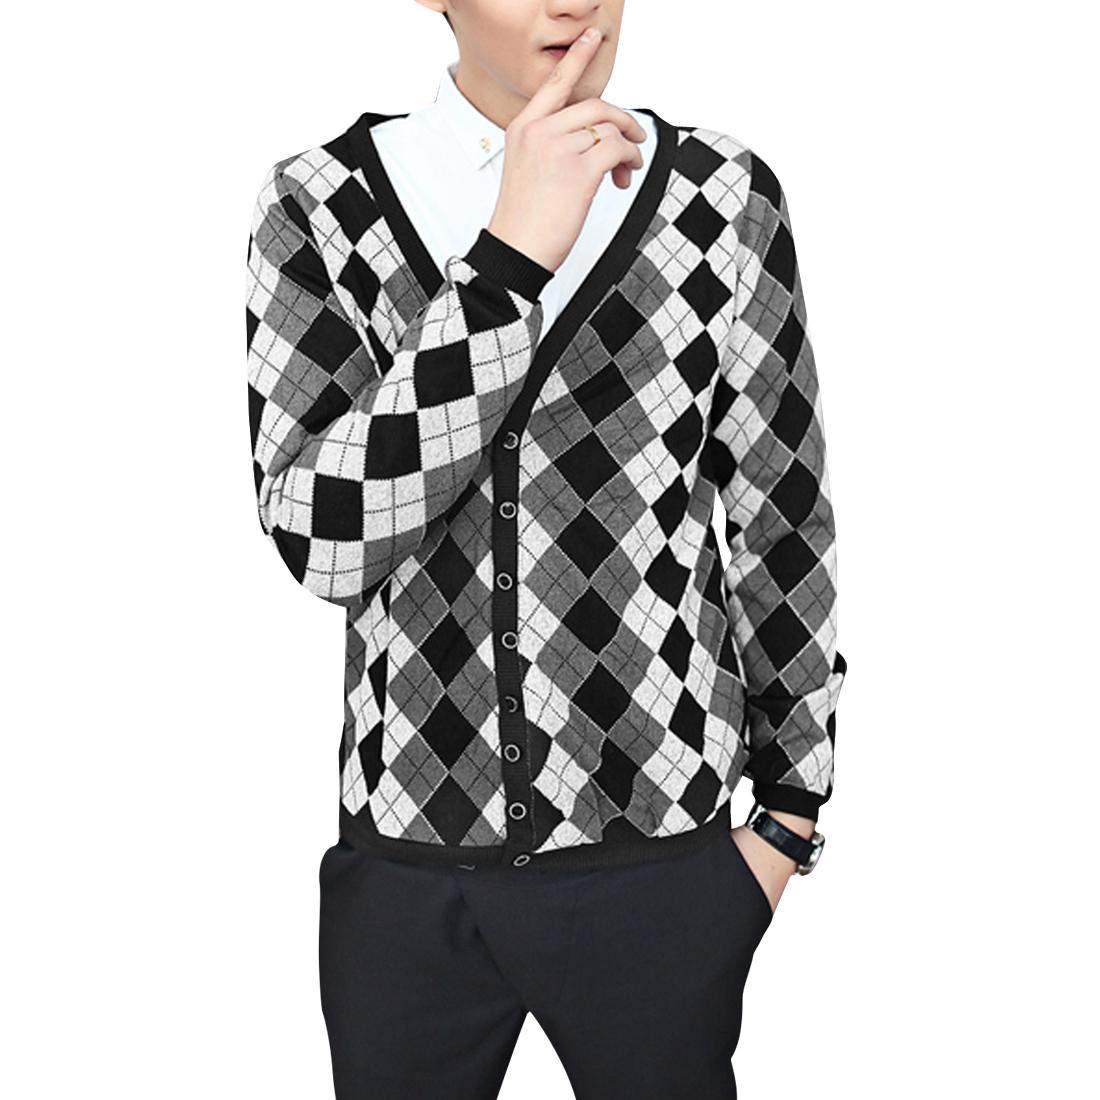 Men Argyle Pattern Long Sleeve Multicolor Knit Cardigan Shirt S